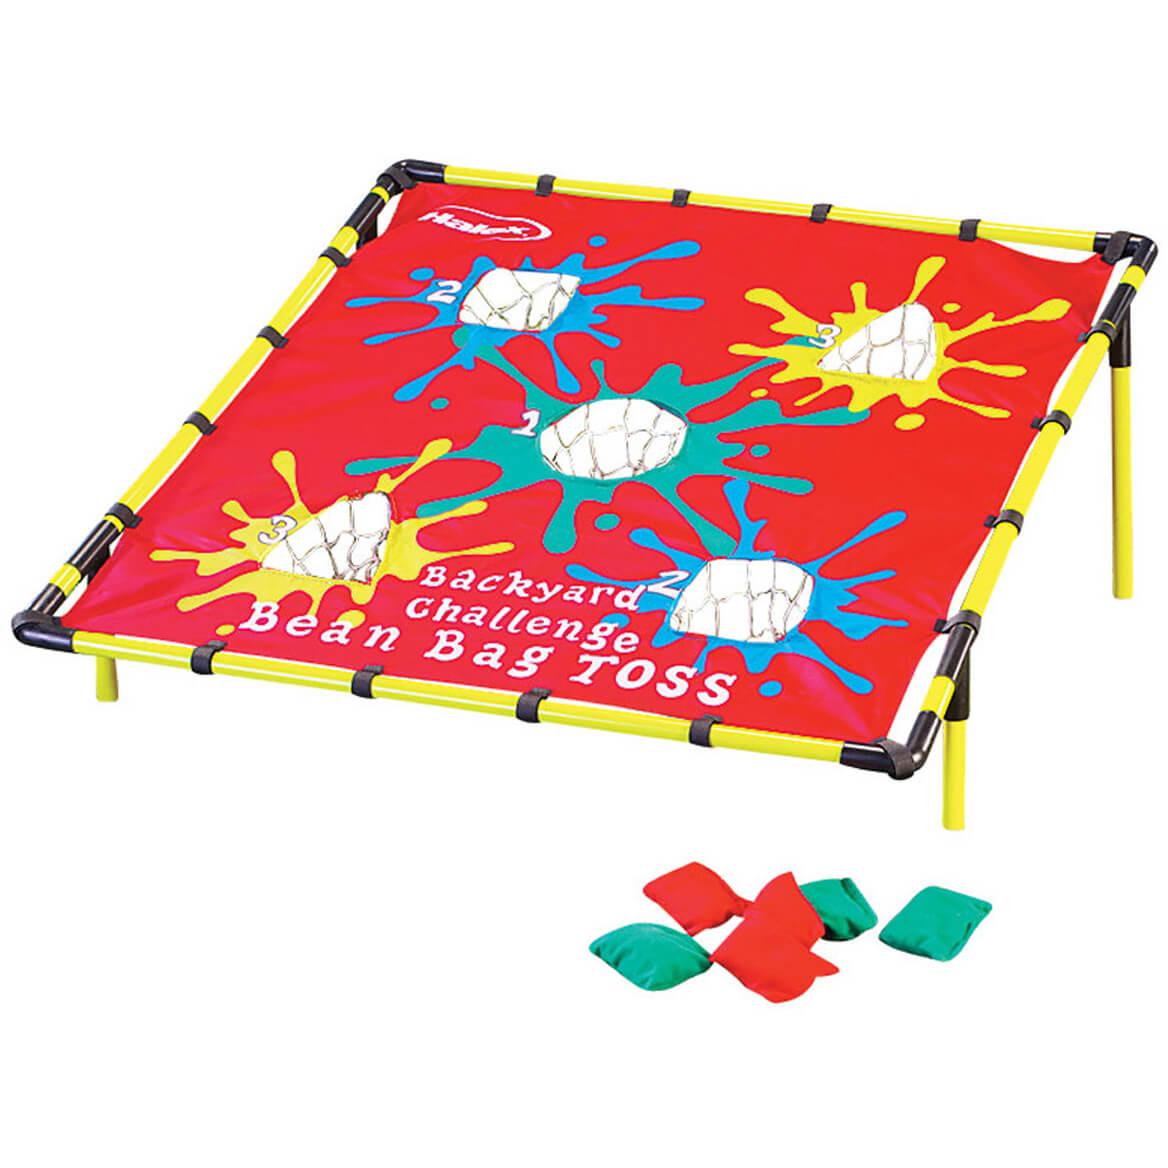 Bean Bag Toss Game-318177